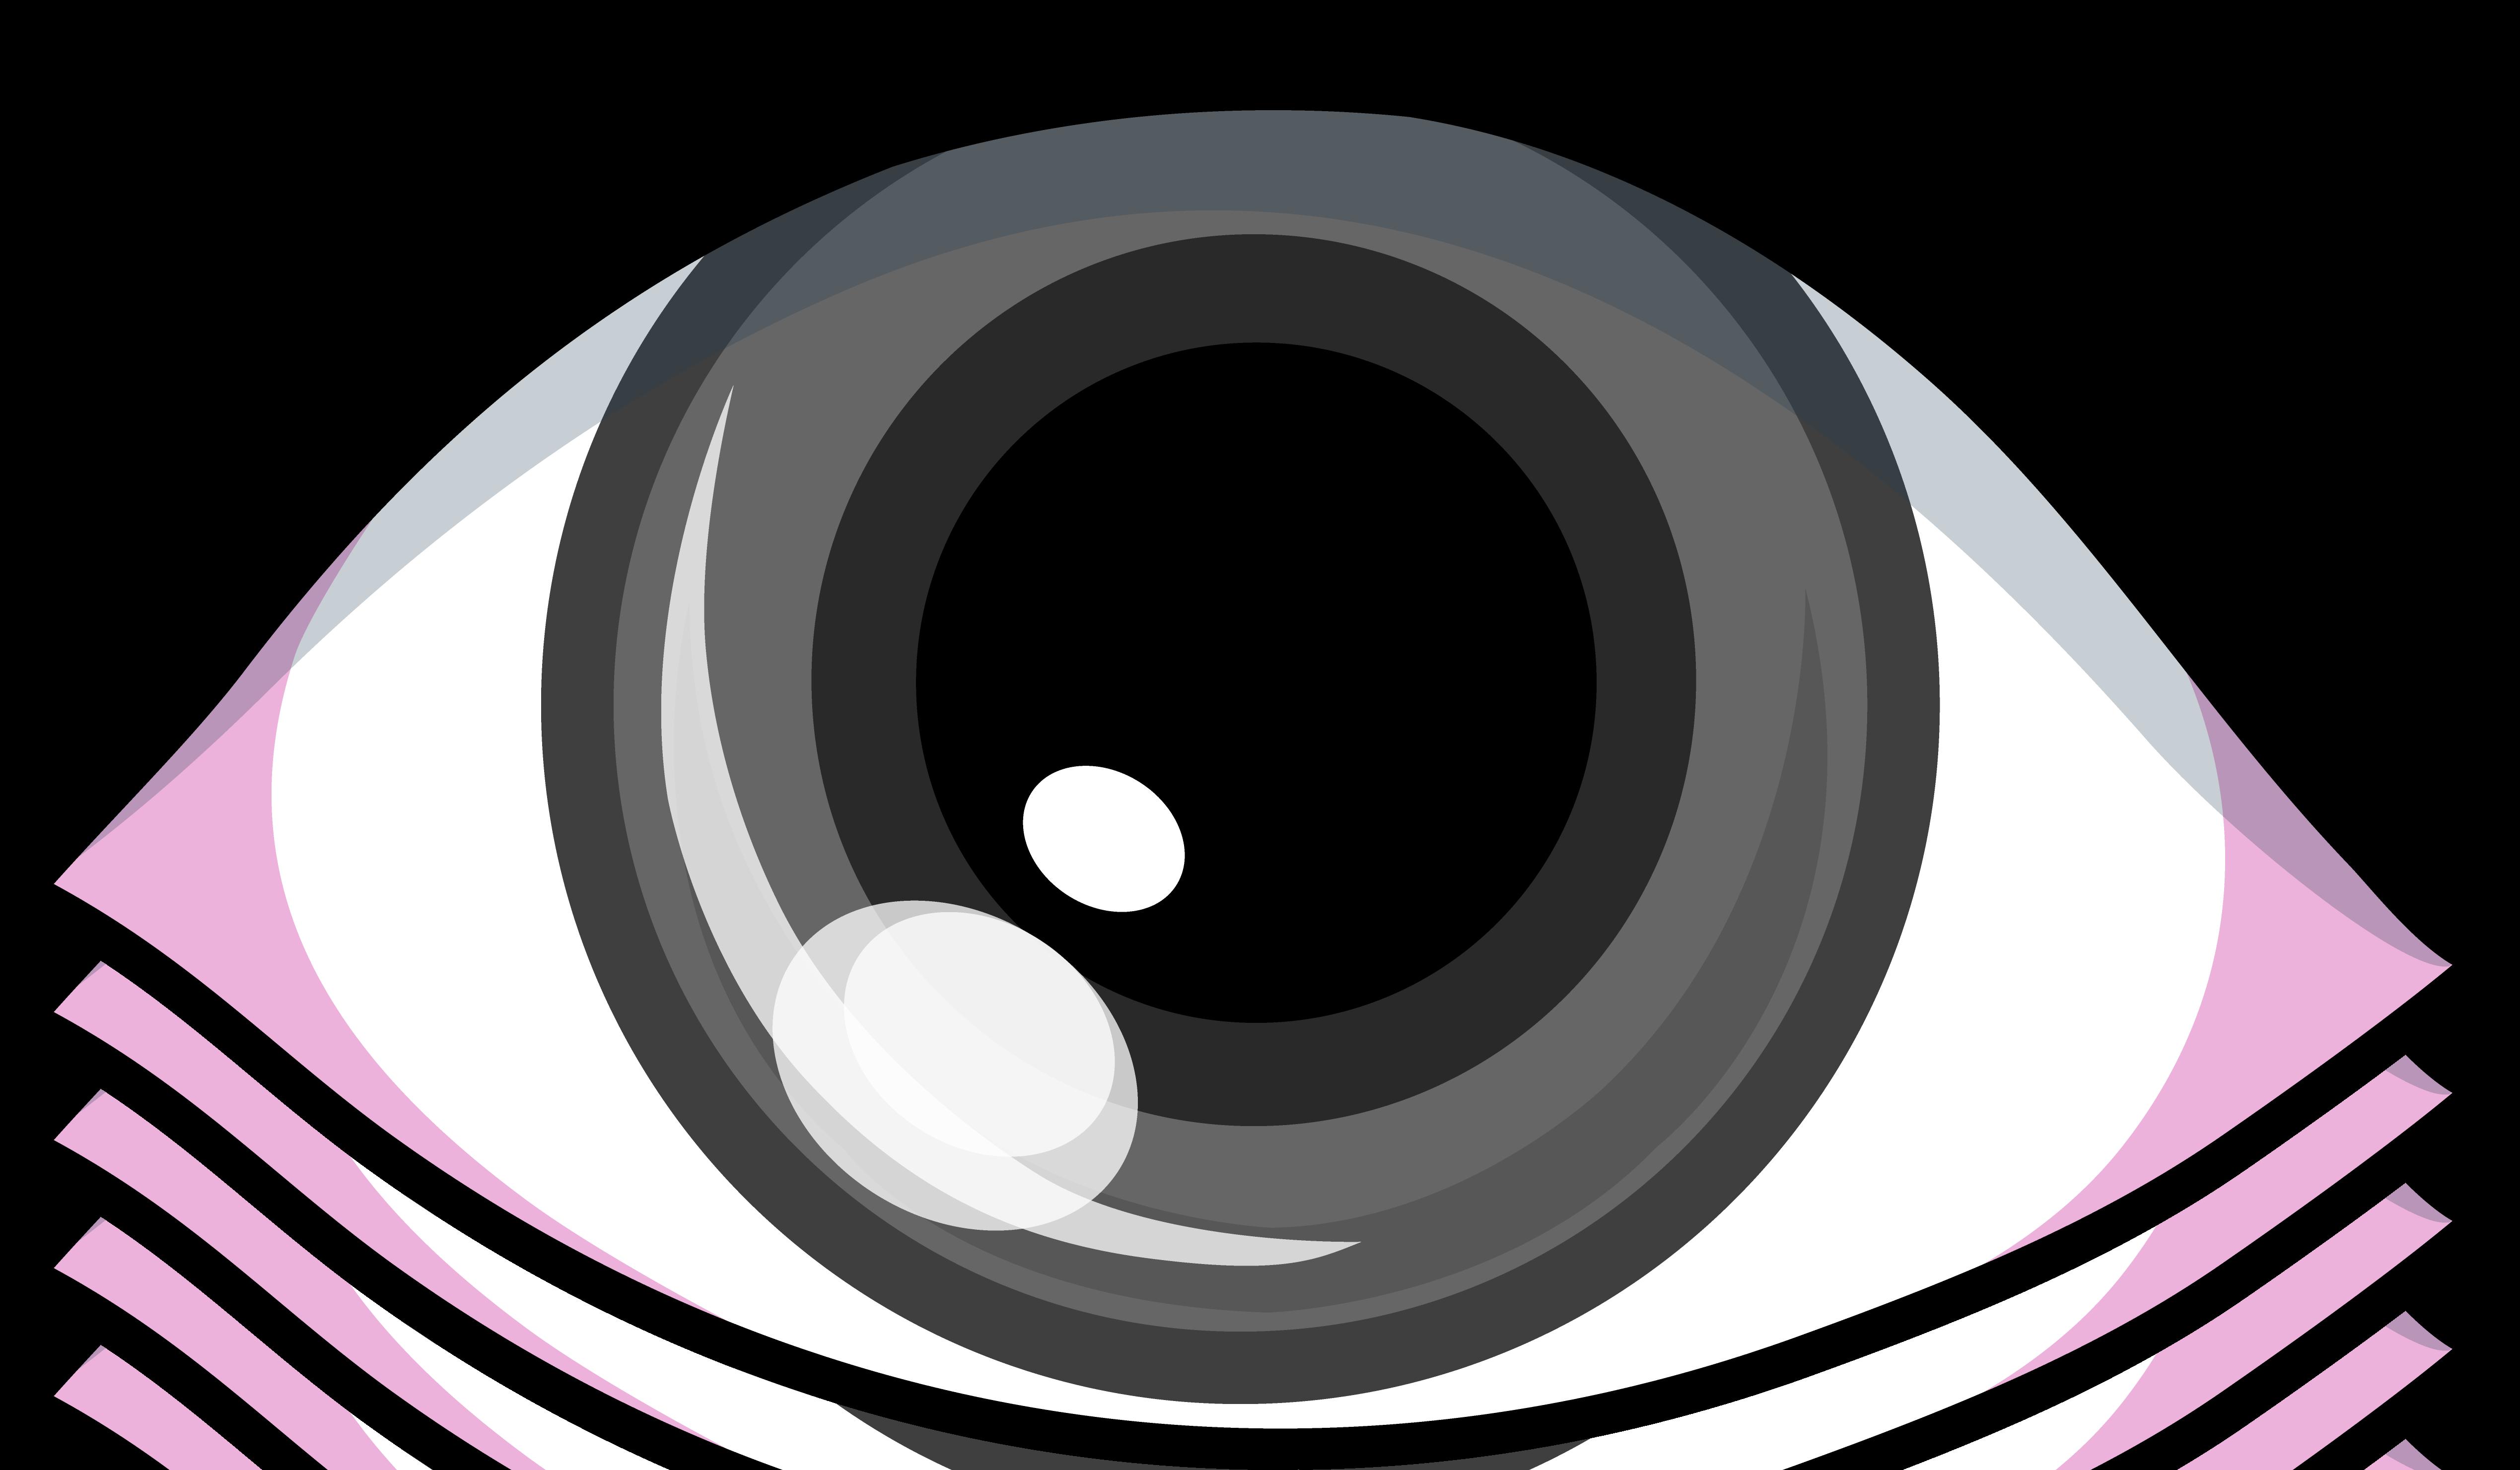 5076x2962 Grey Eye Clip Art Design Clipart Panda